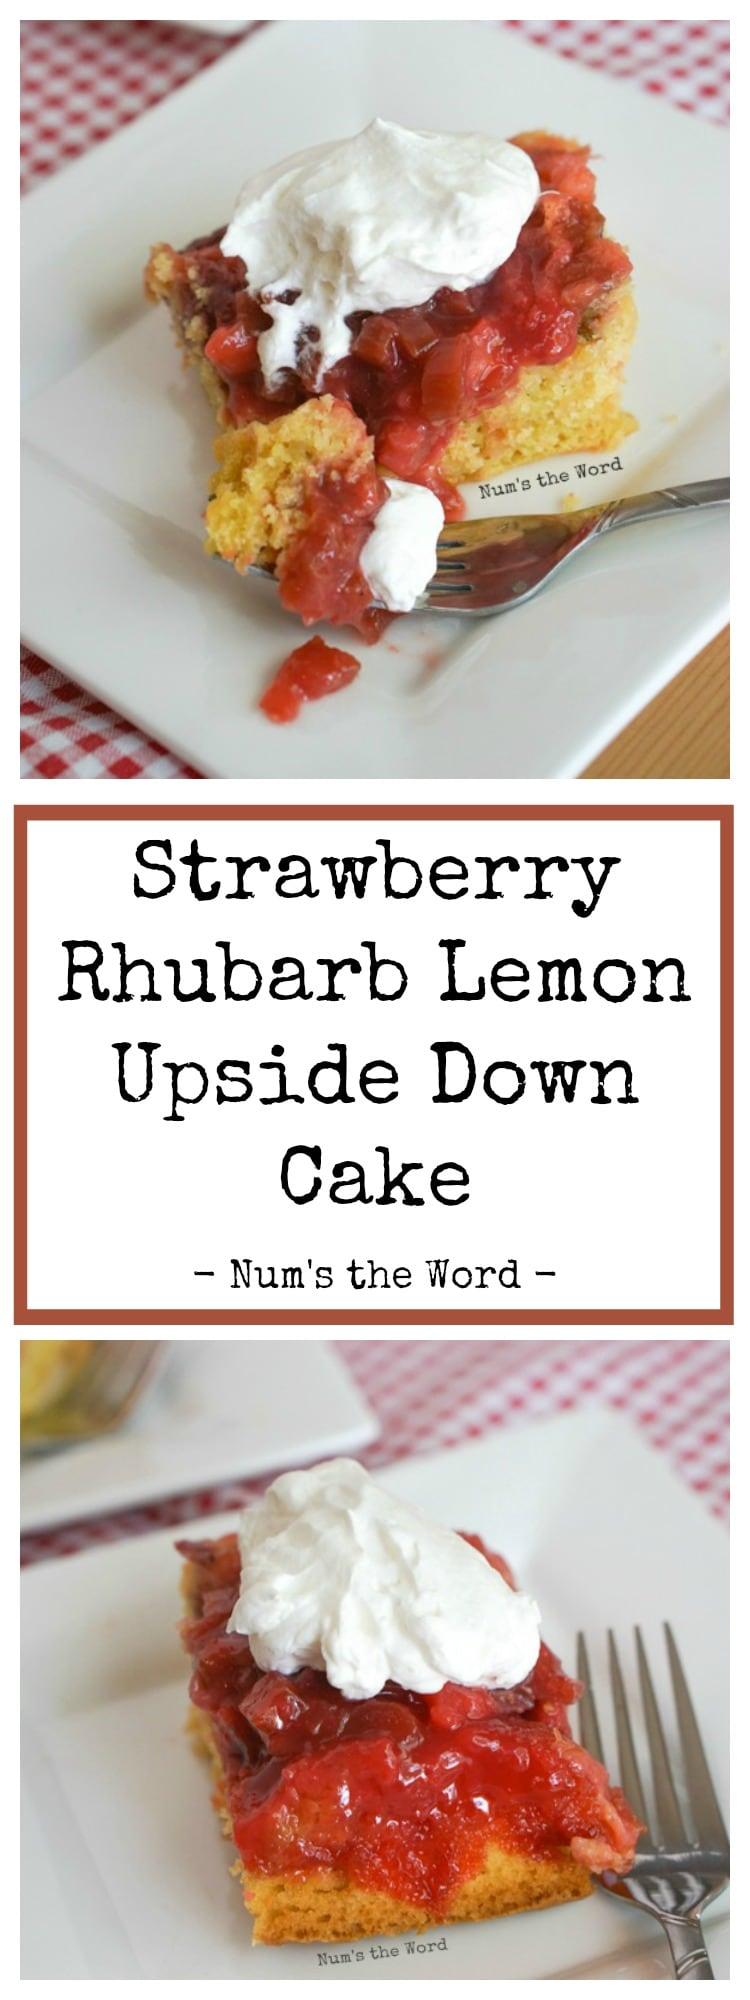 Strawberry Rhubarb Lemon Upside Down Cake